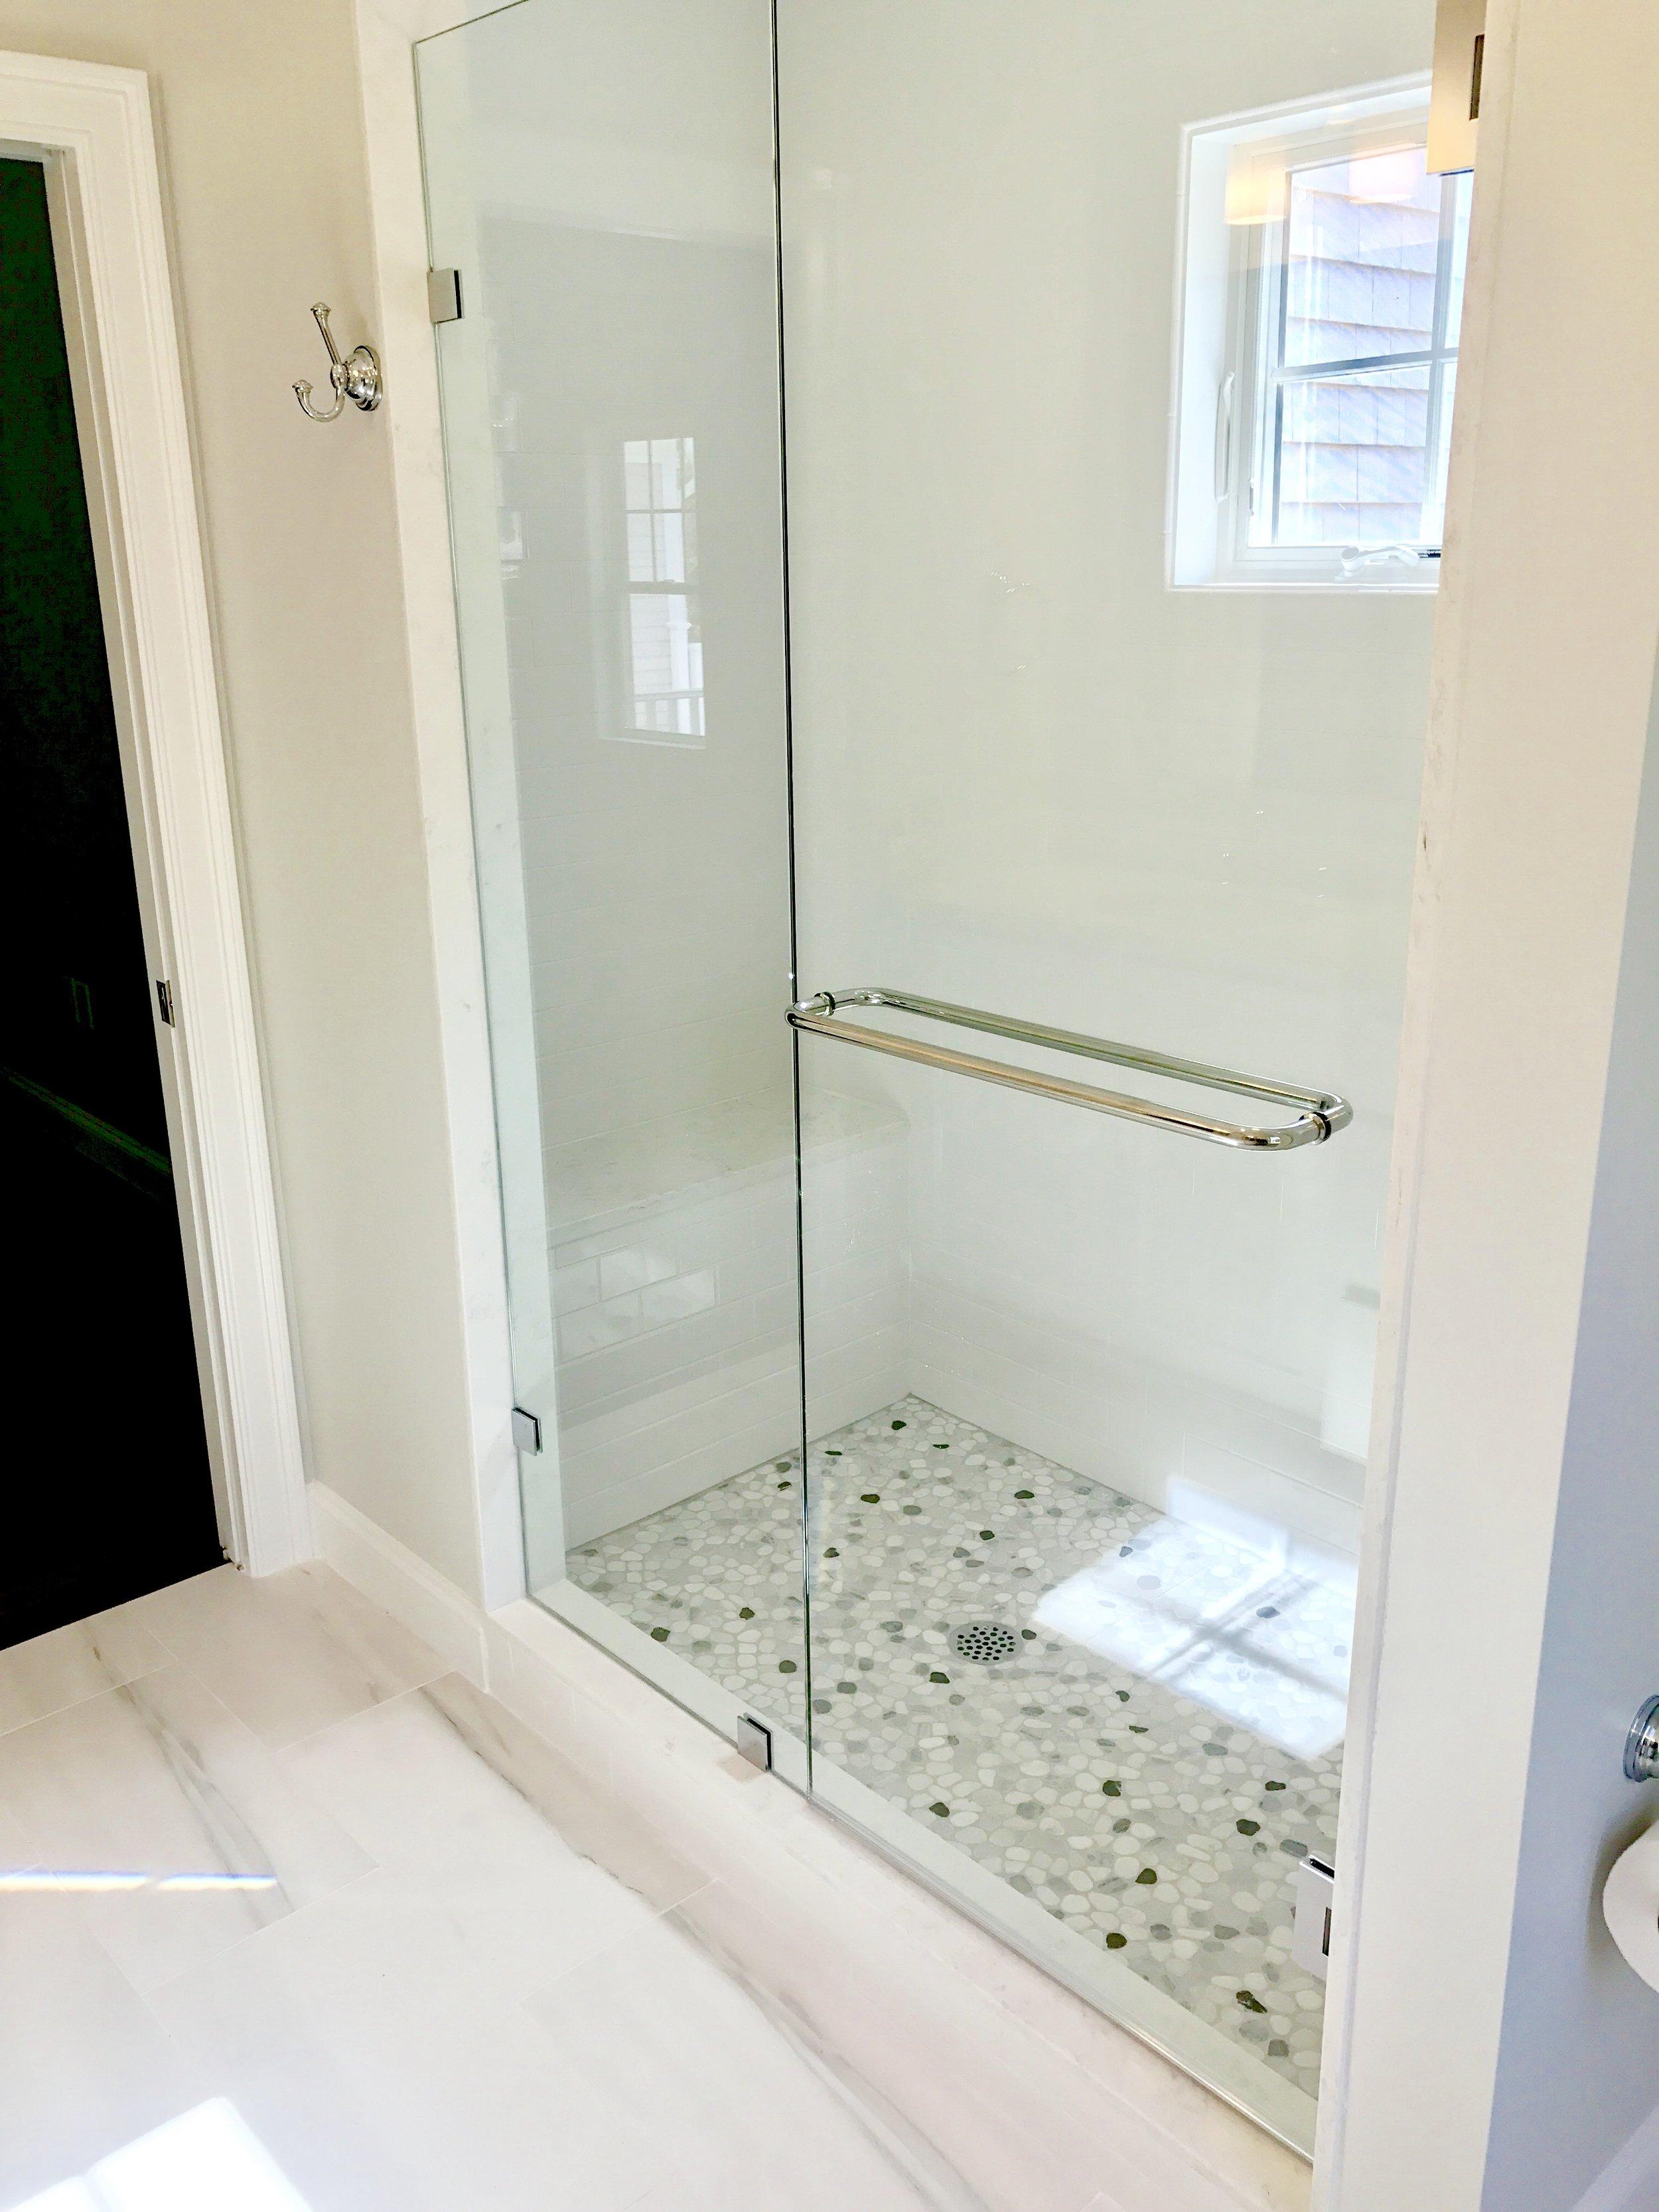 34 cran 8-2-18 pic master shower.jpg